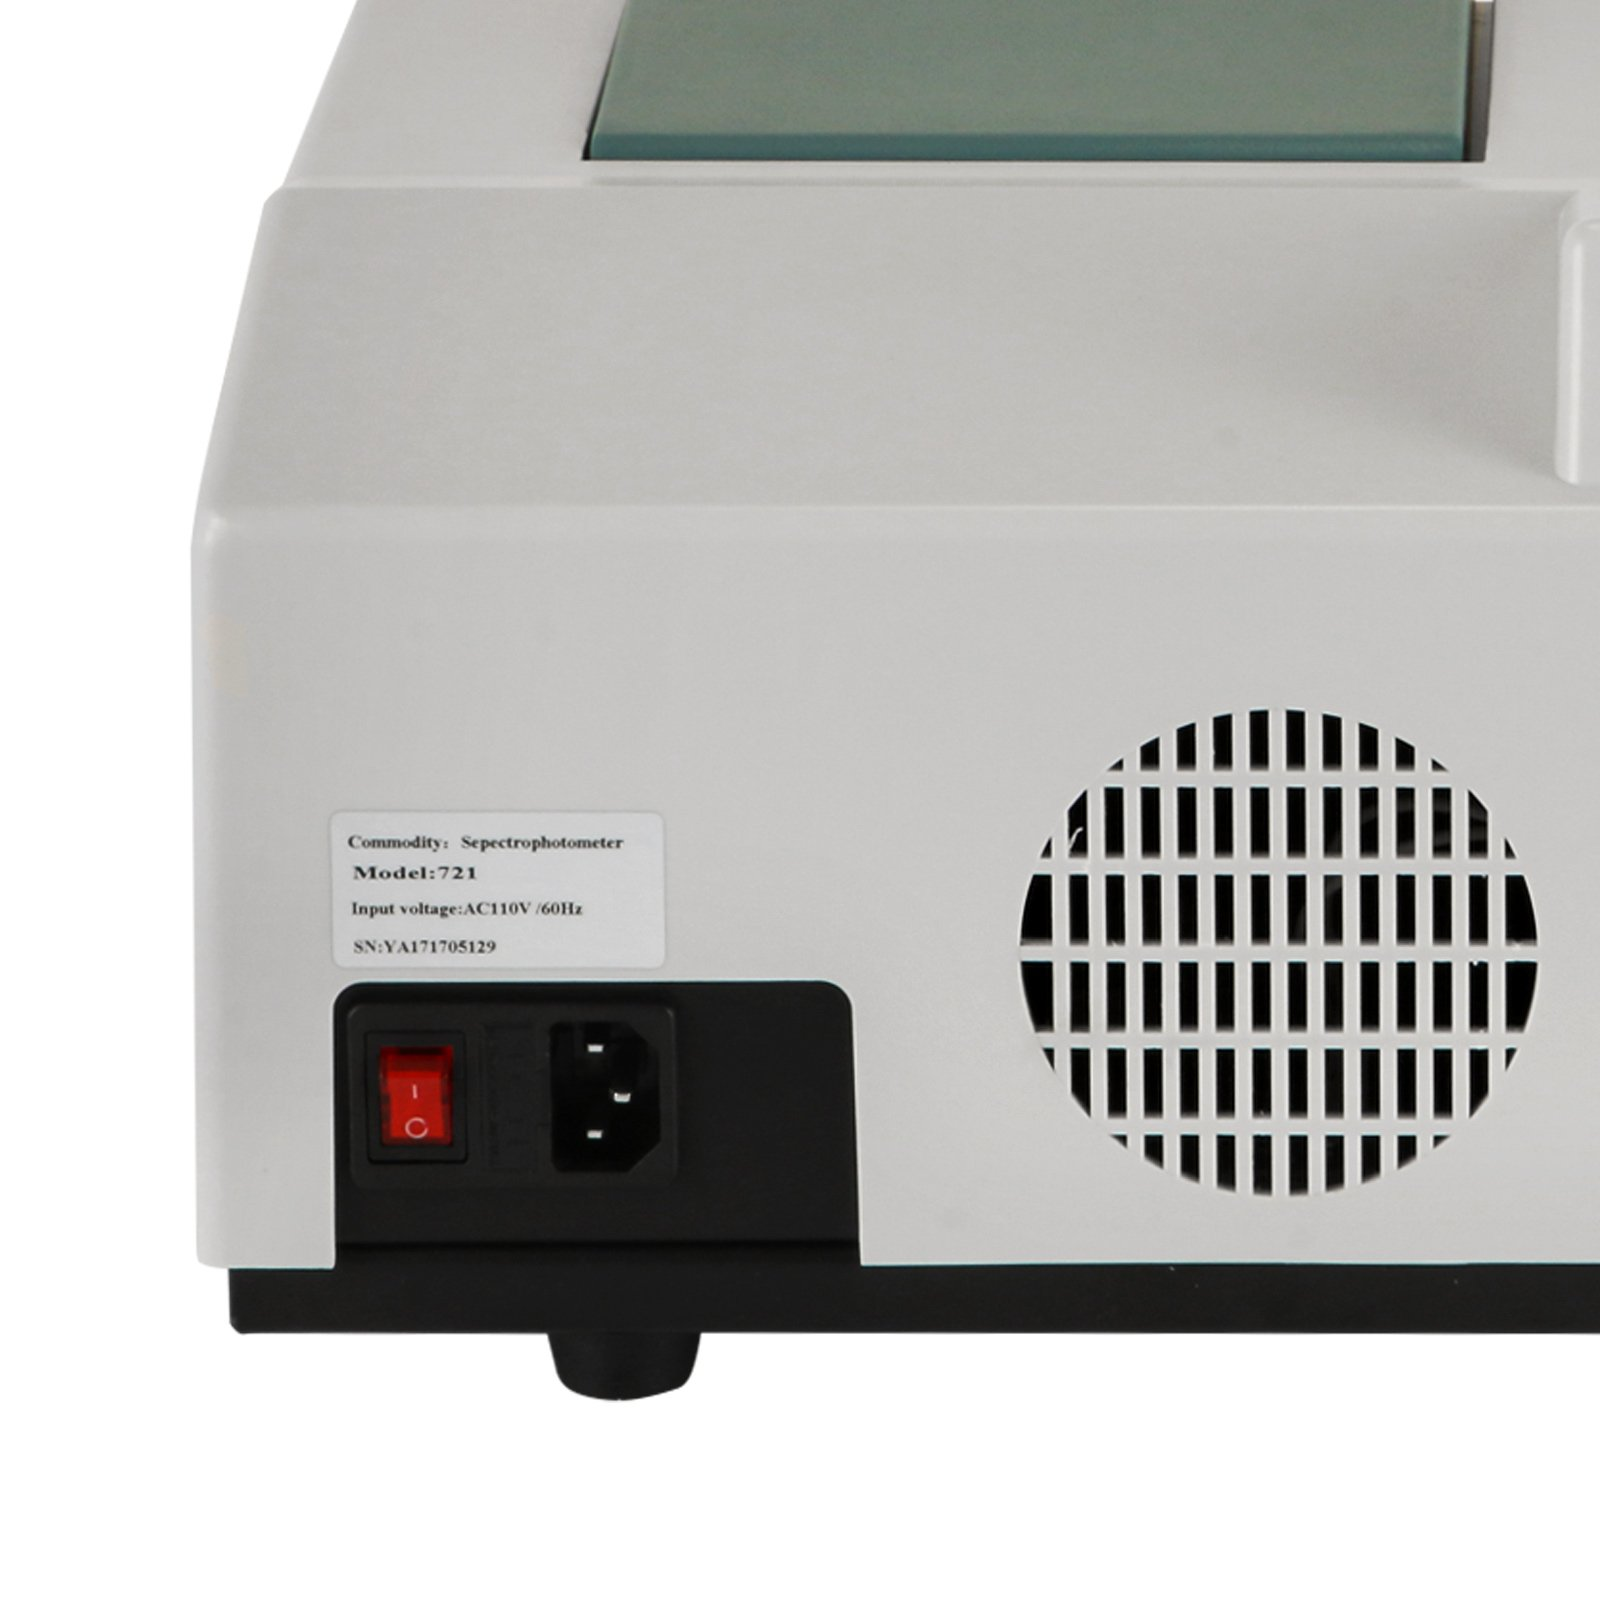 BestEquip 6nm Visible Spectrophotometer 721 350-1020nm Wavelength Range Spectrophotometer Portable Lab Equipment (Type 721) by BestEquip